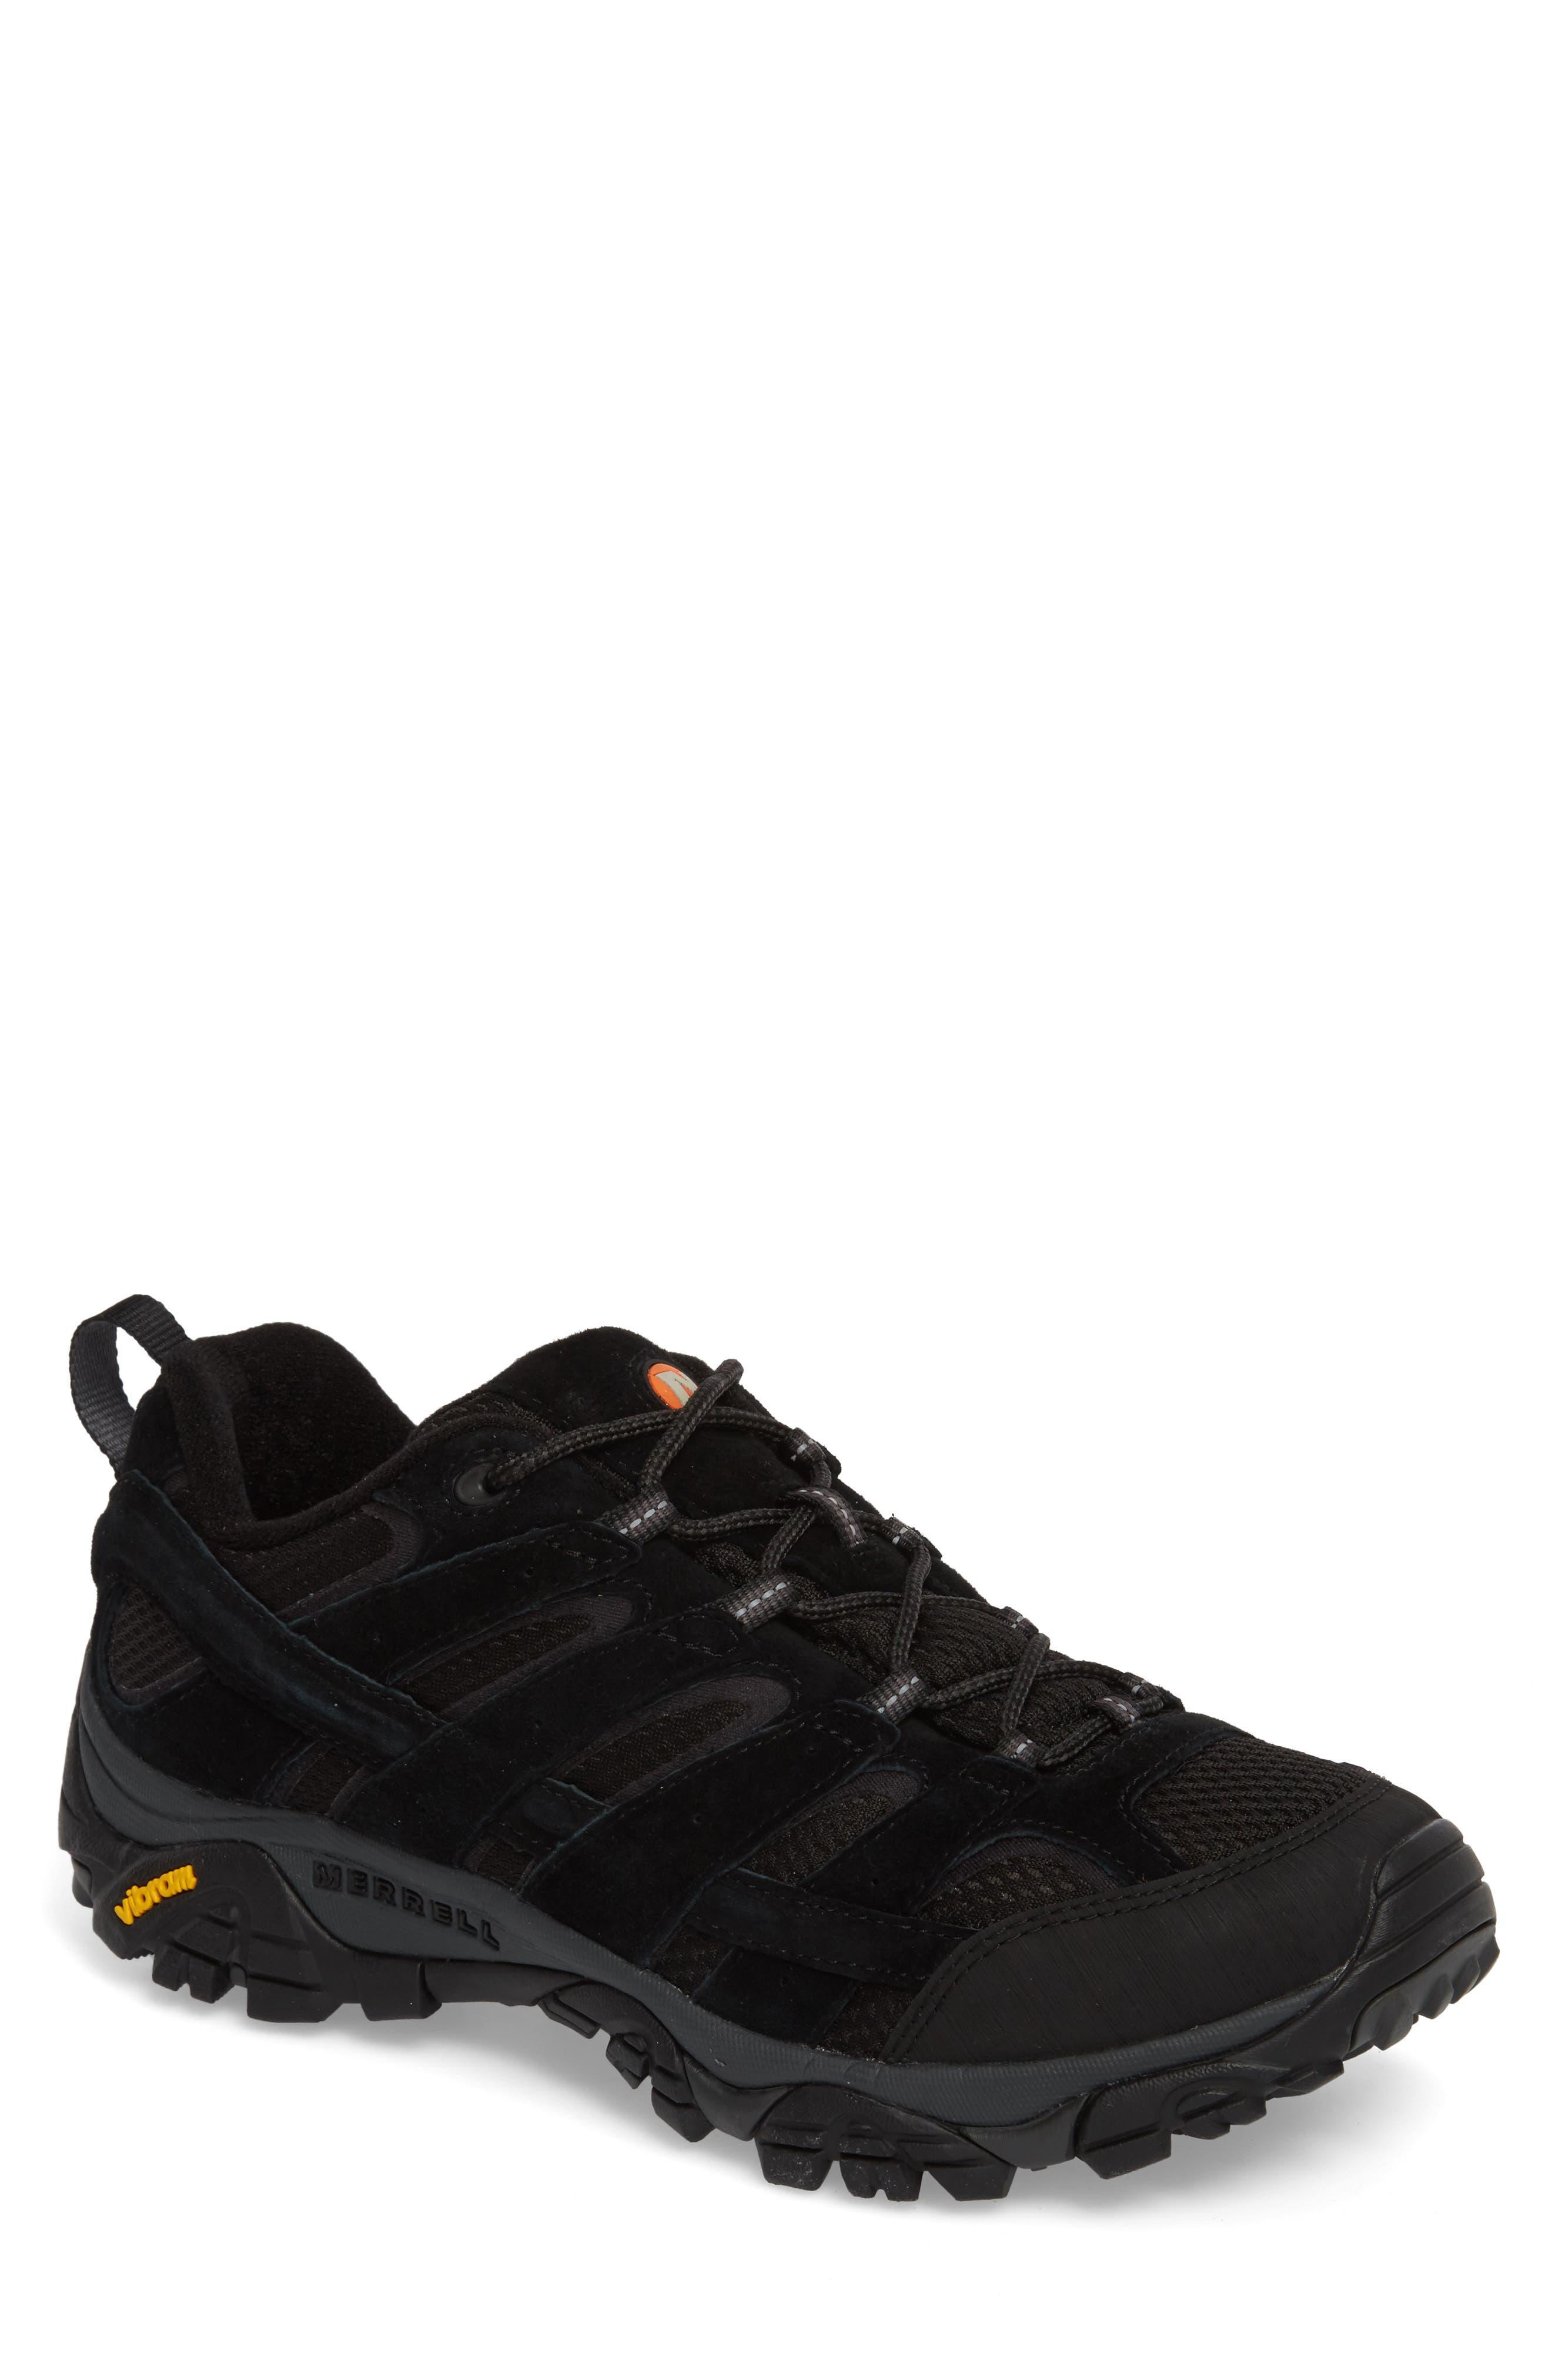 MERRELL Moab 2 Ventilator Hiking Shoe, Main, color, BLACK NIGHT